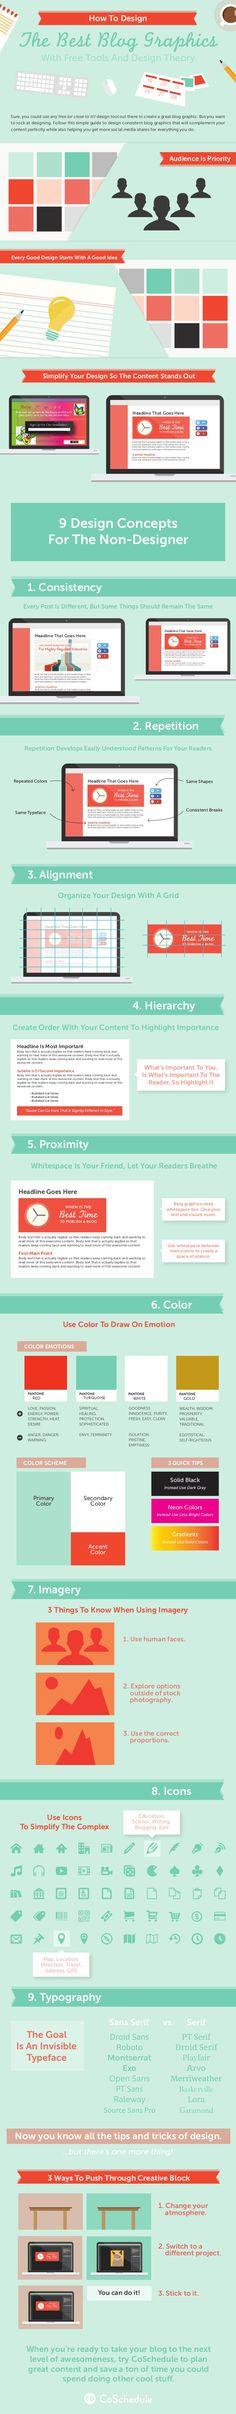 The best blog graphics #design #socialmedia